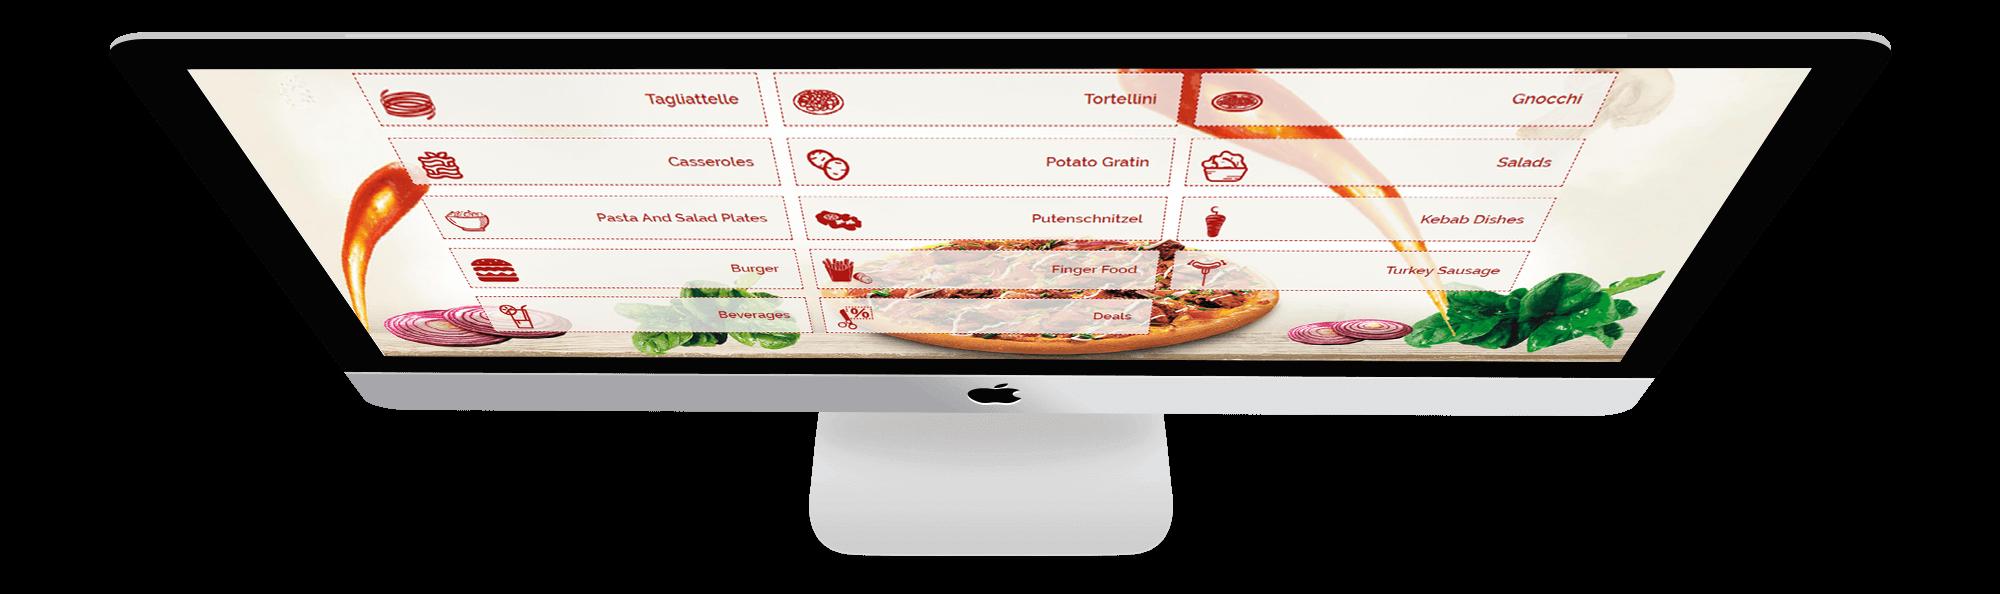 pizza-plaza_imac